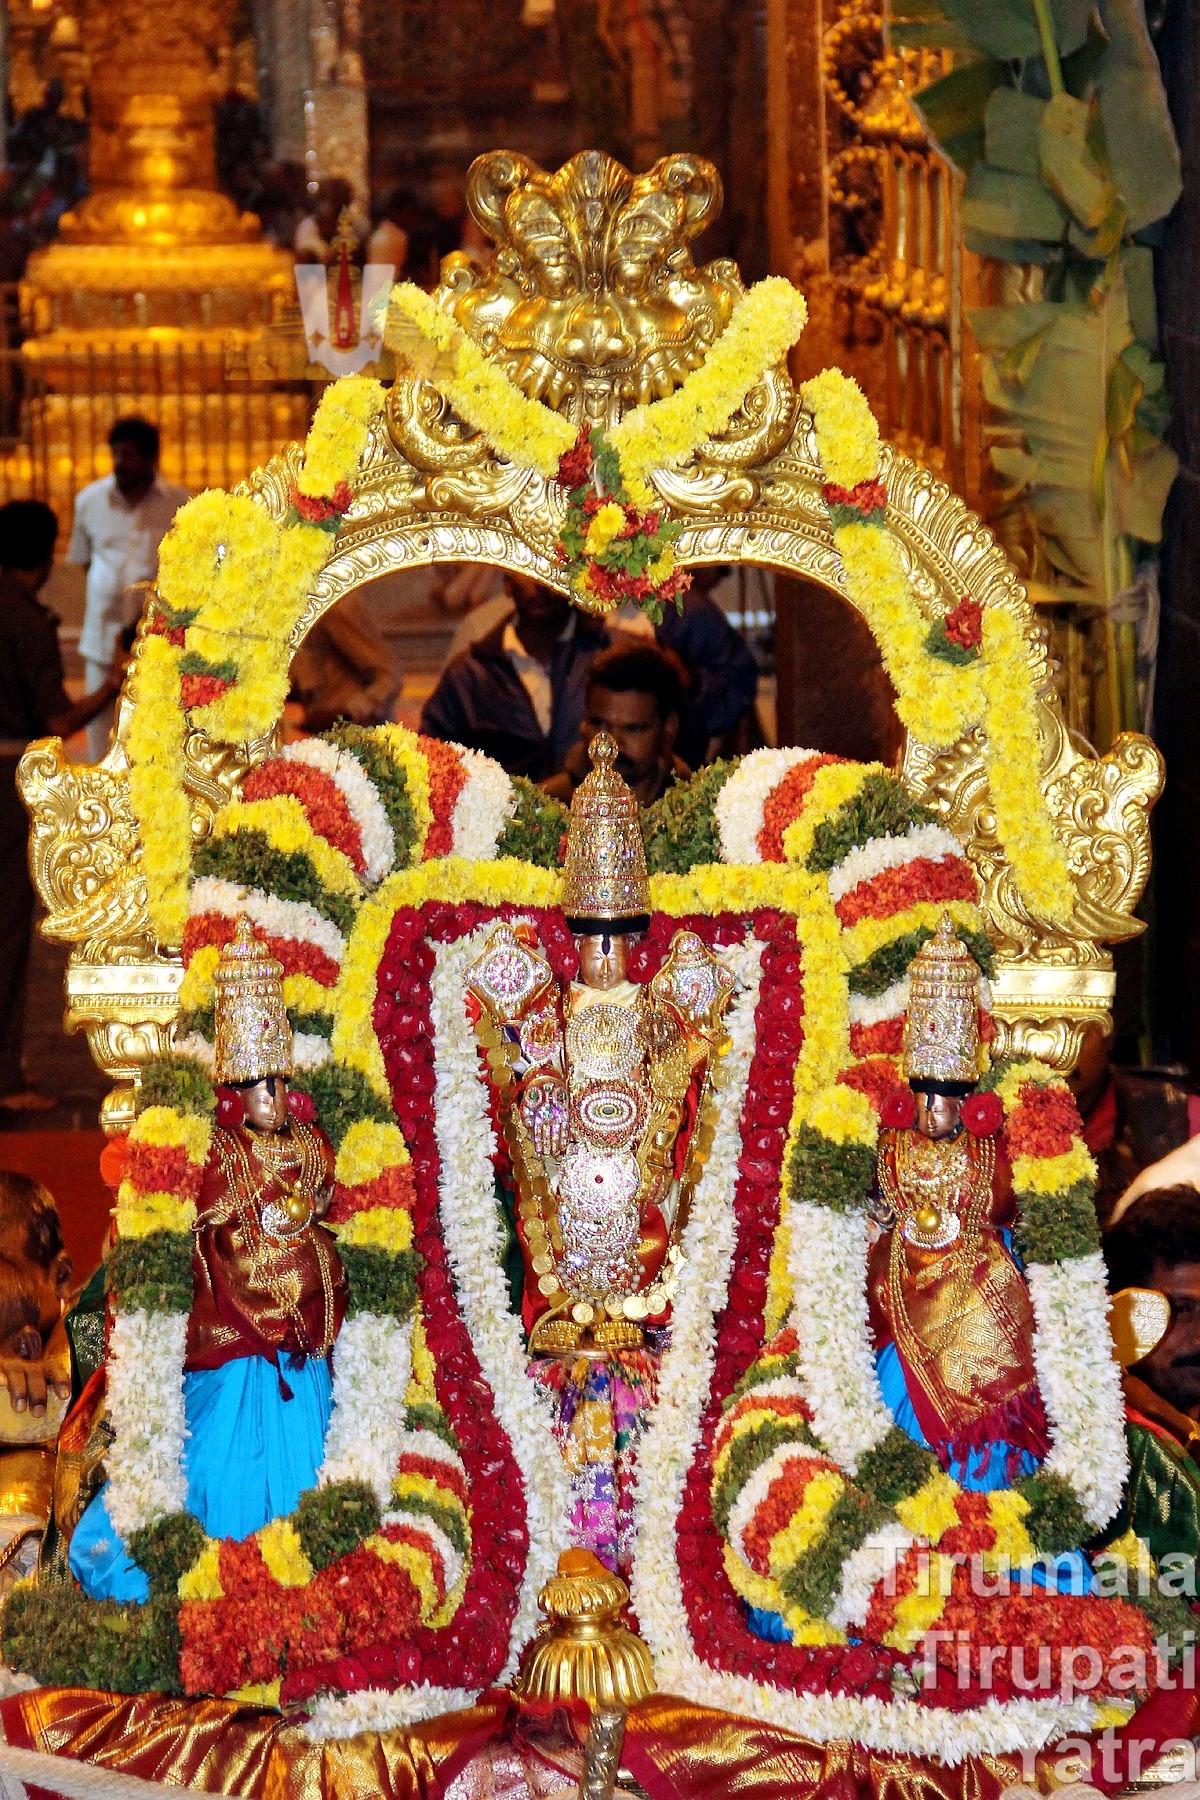 Snapana Murthy